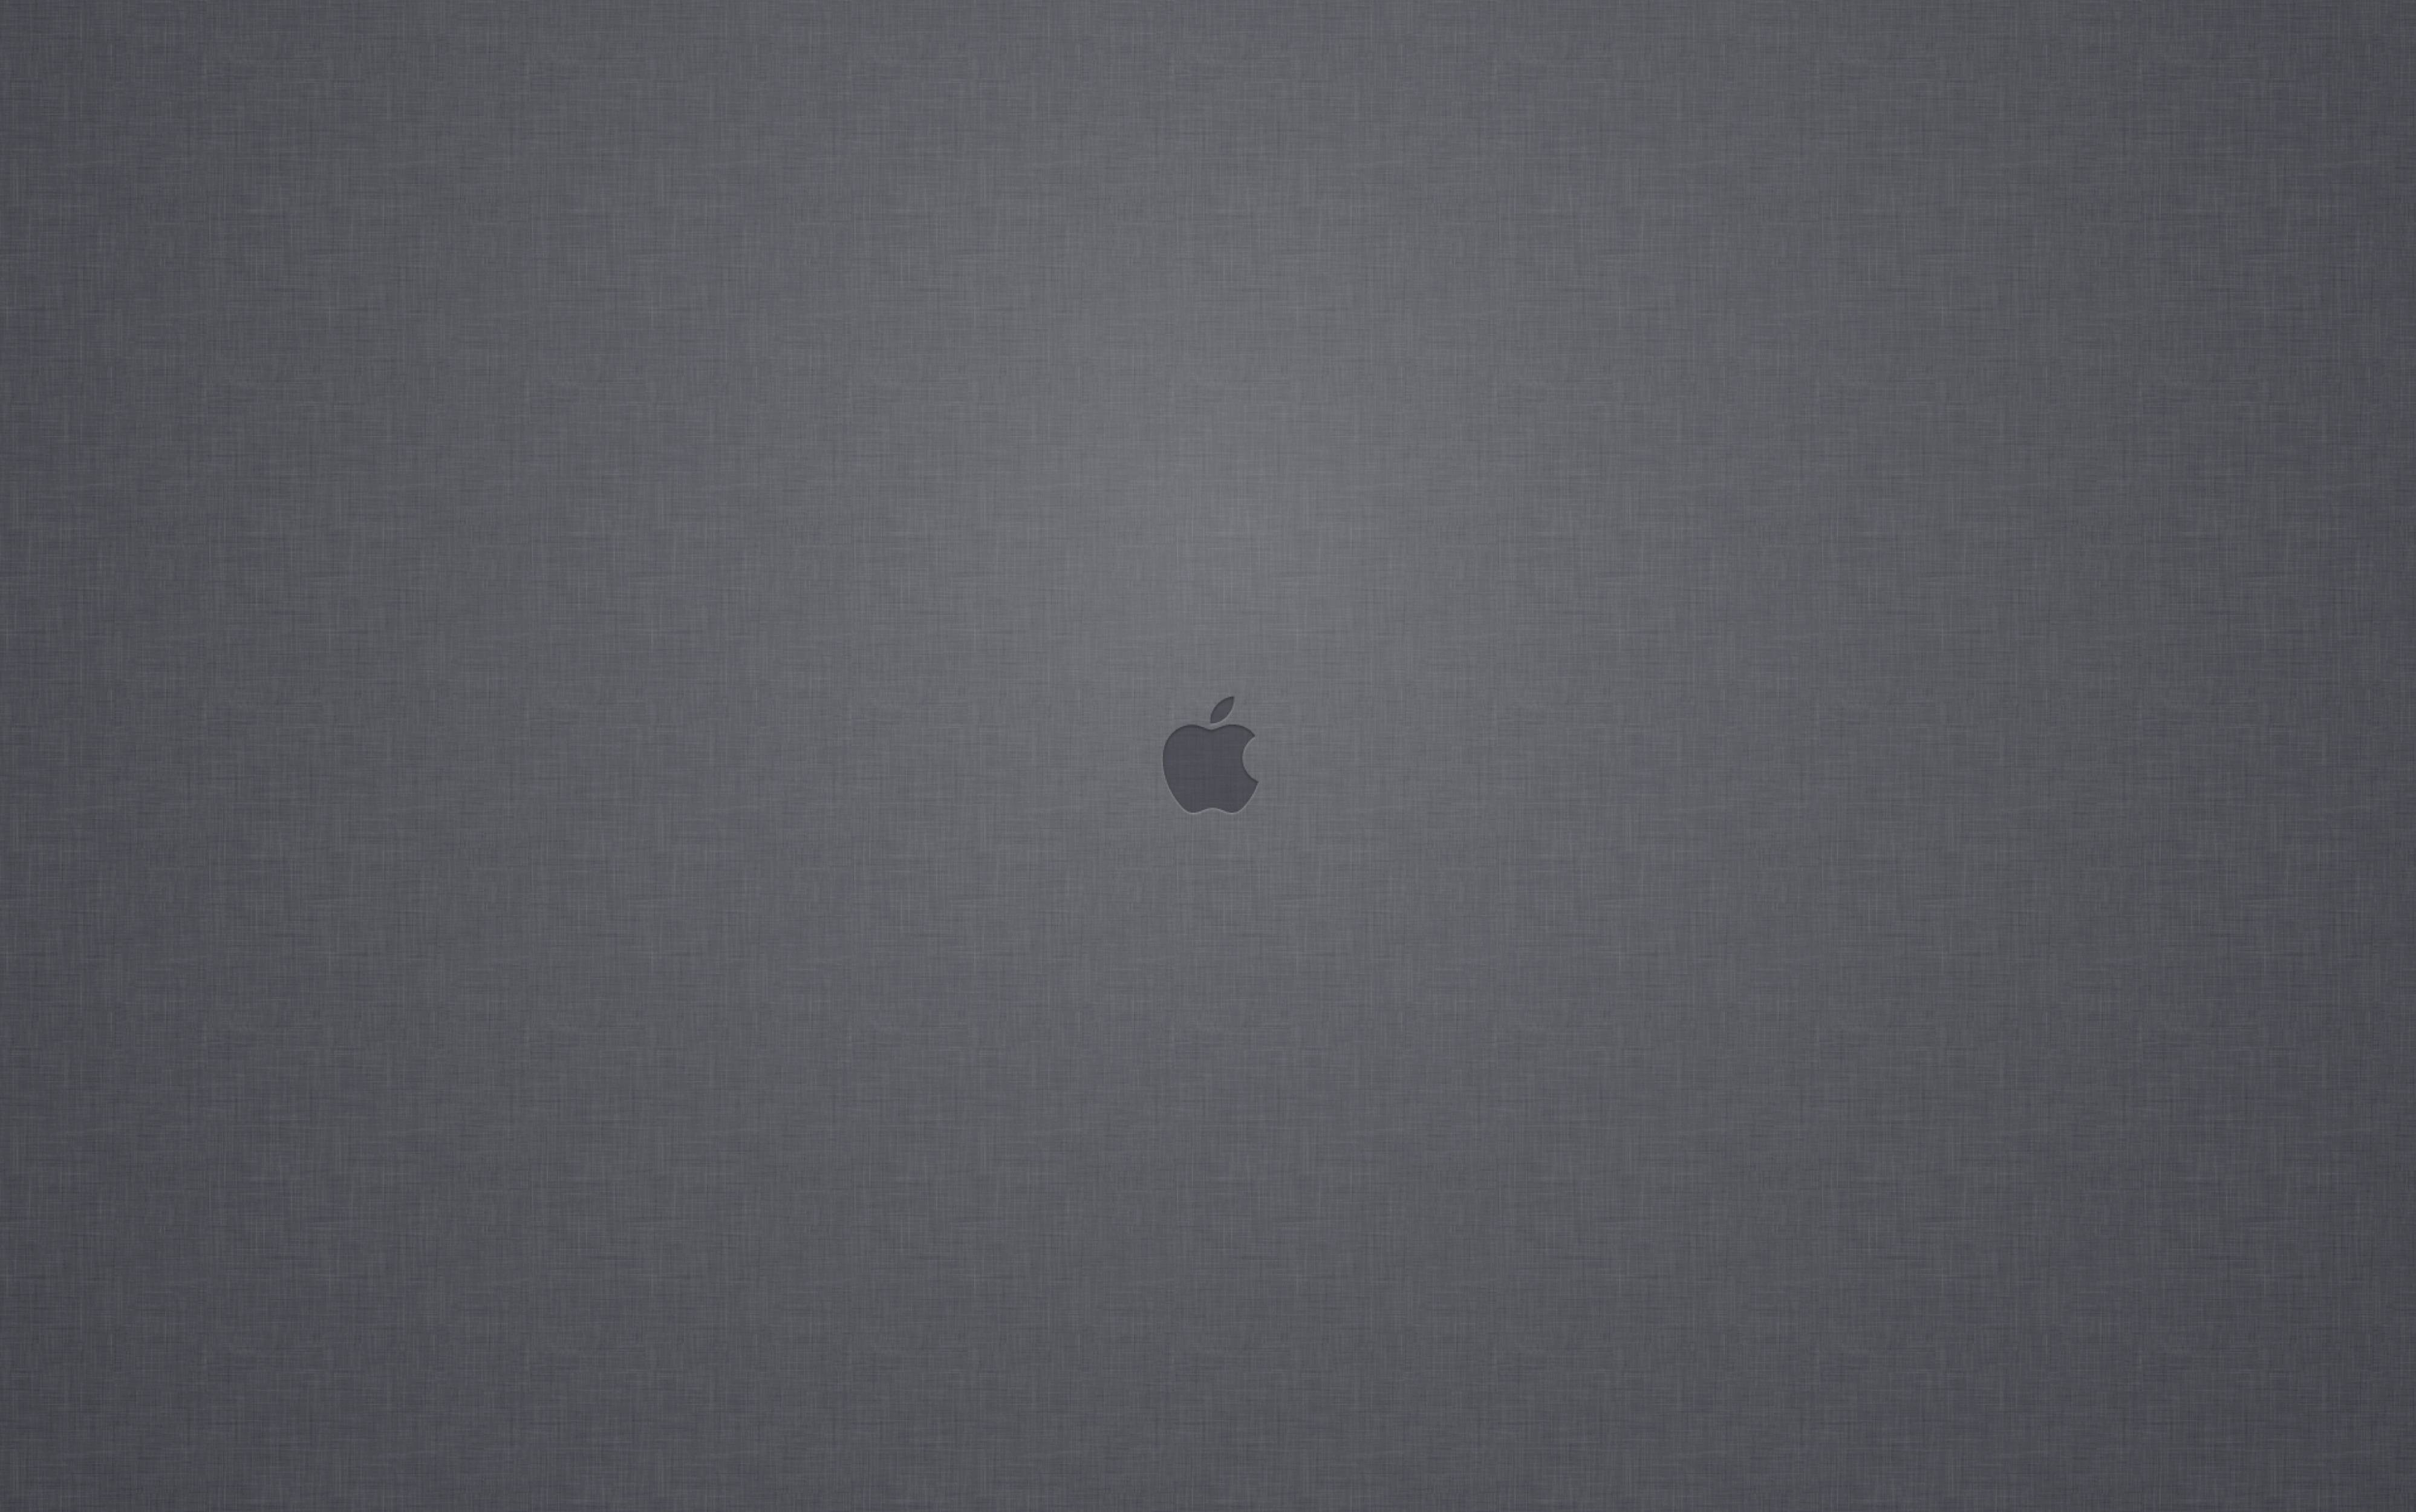 osxdailycomLinen Apple Logo Wallpaper from the Mac OS X Lion Login 3995x2500